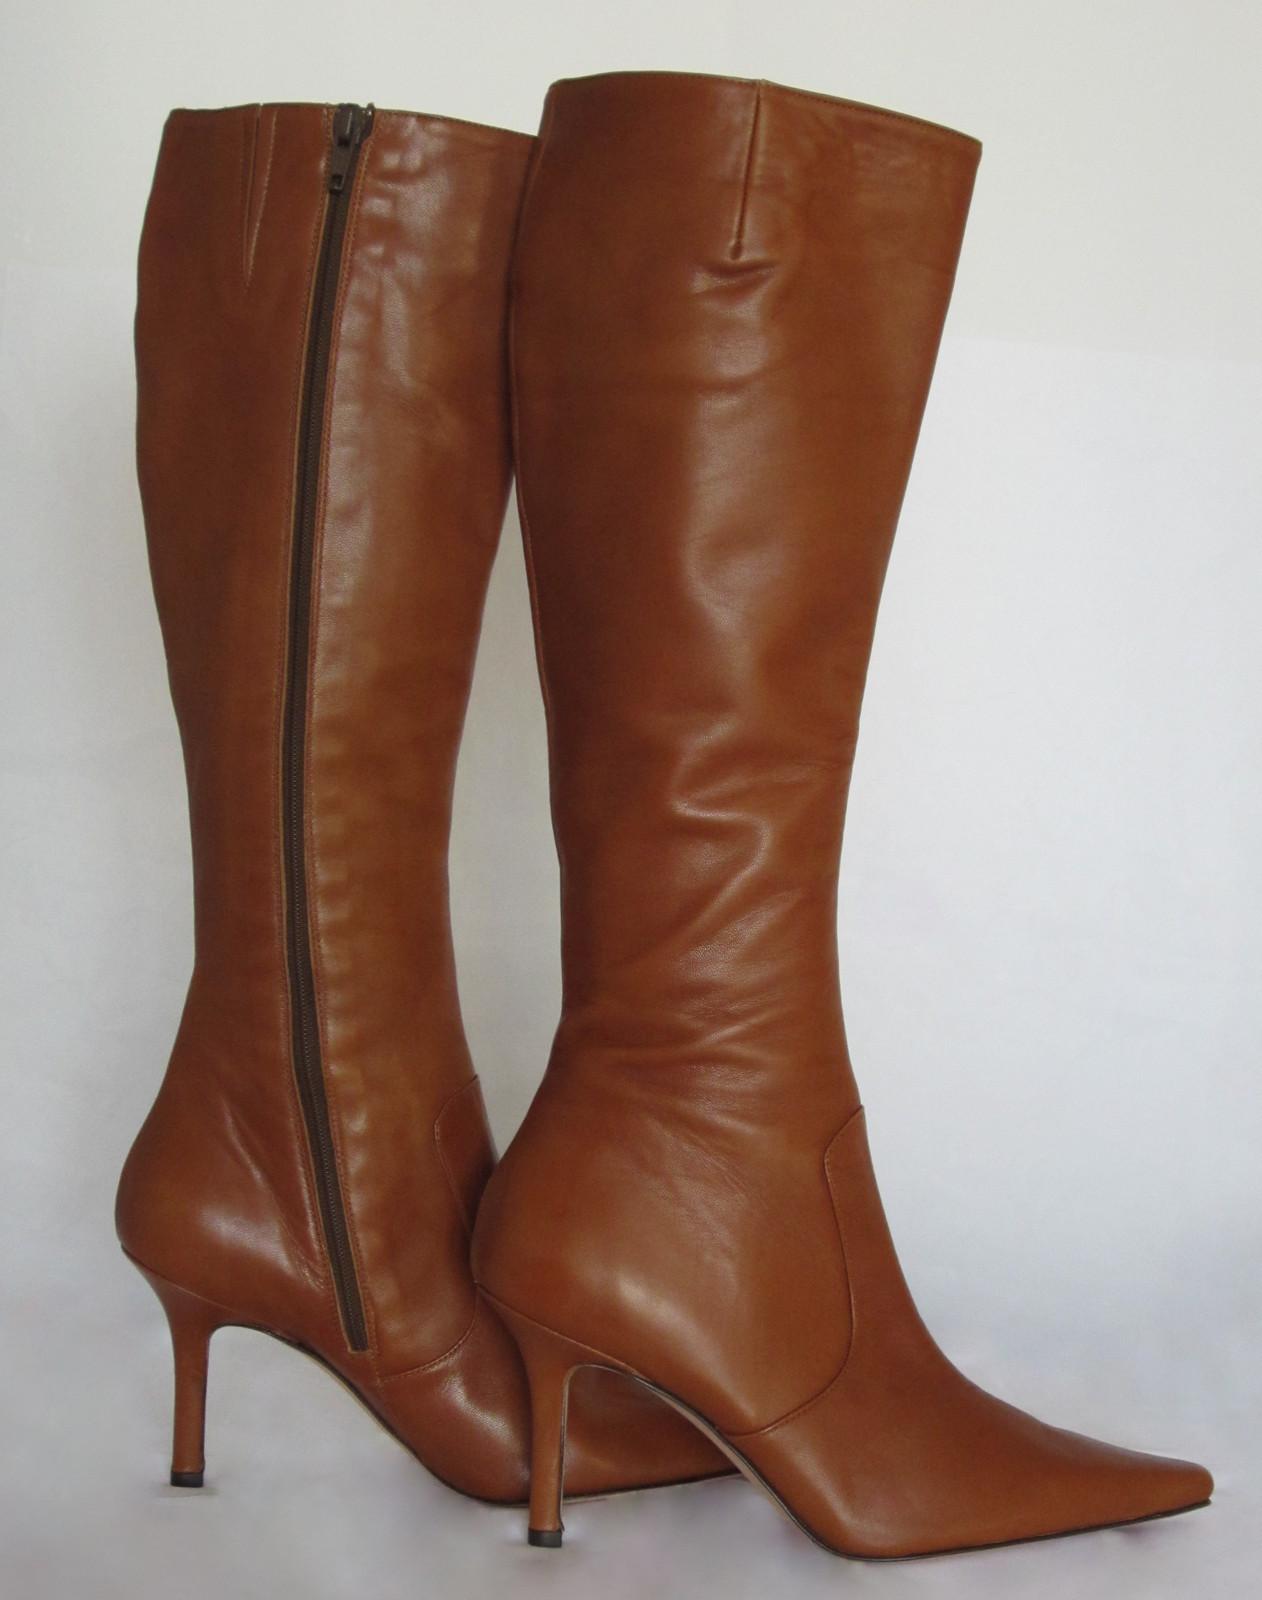 $440 AUTH Isaac Mizrahi cognac leather knee-high boots 6.0 NWOB - $74.95